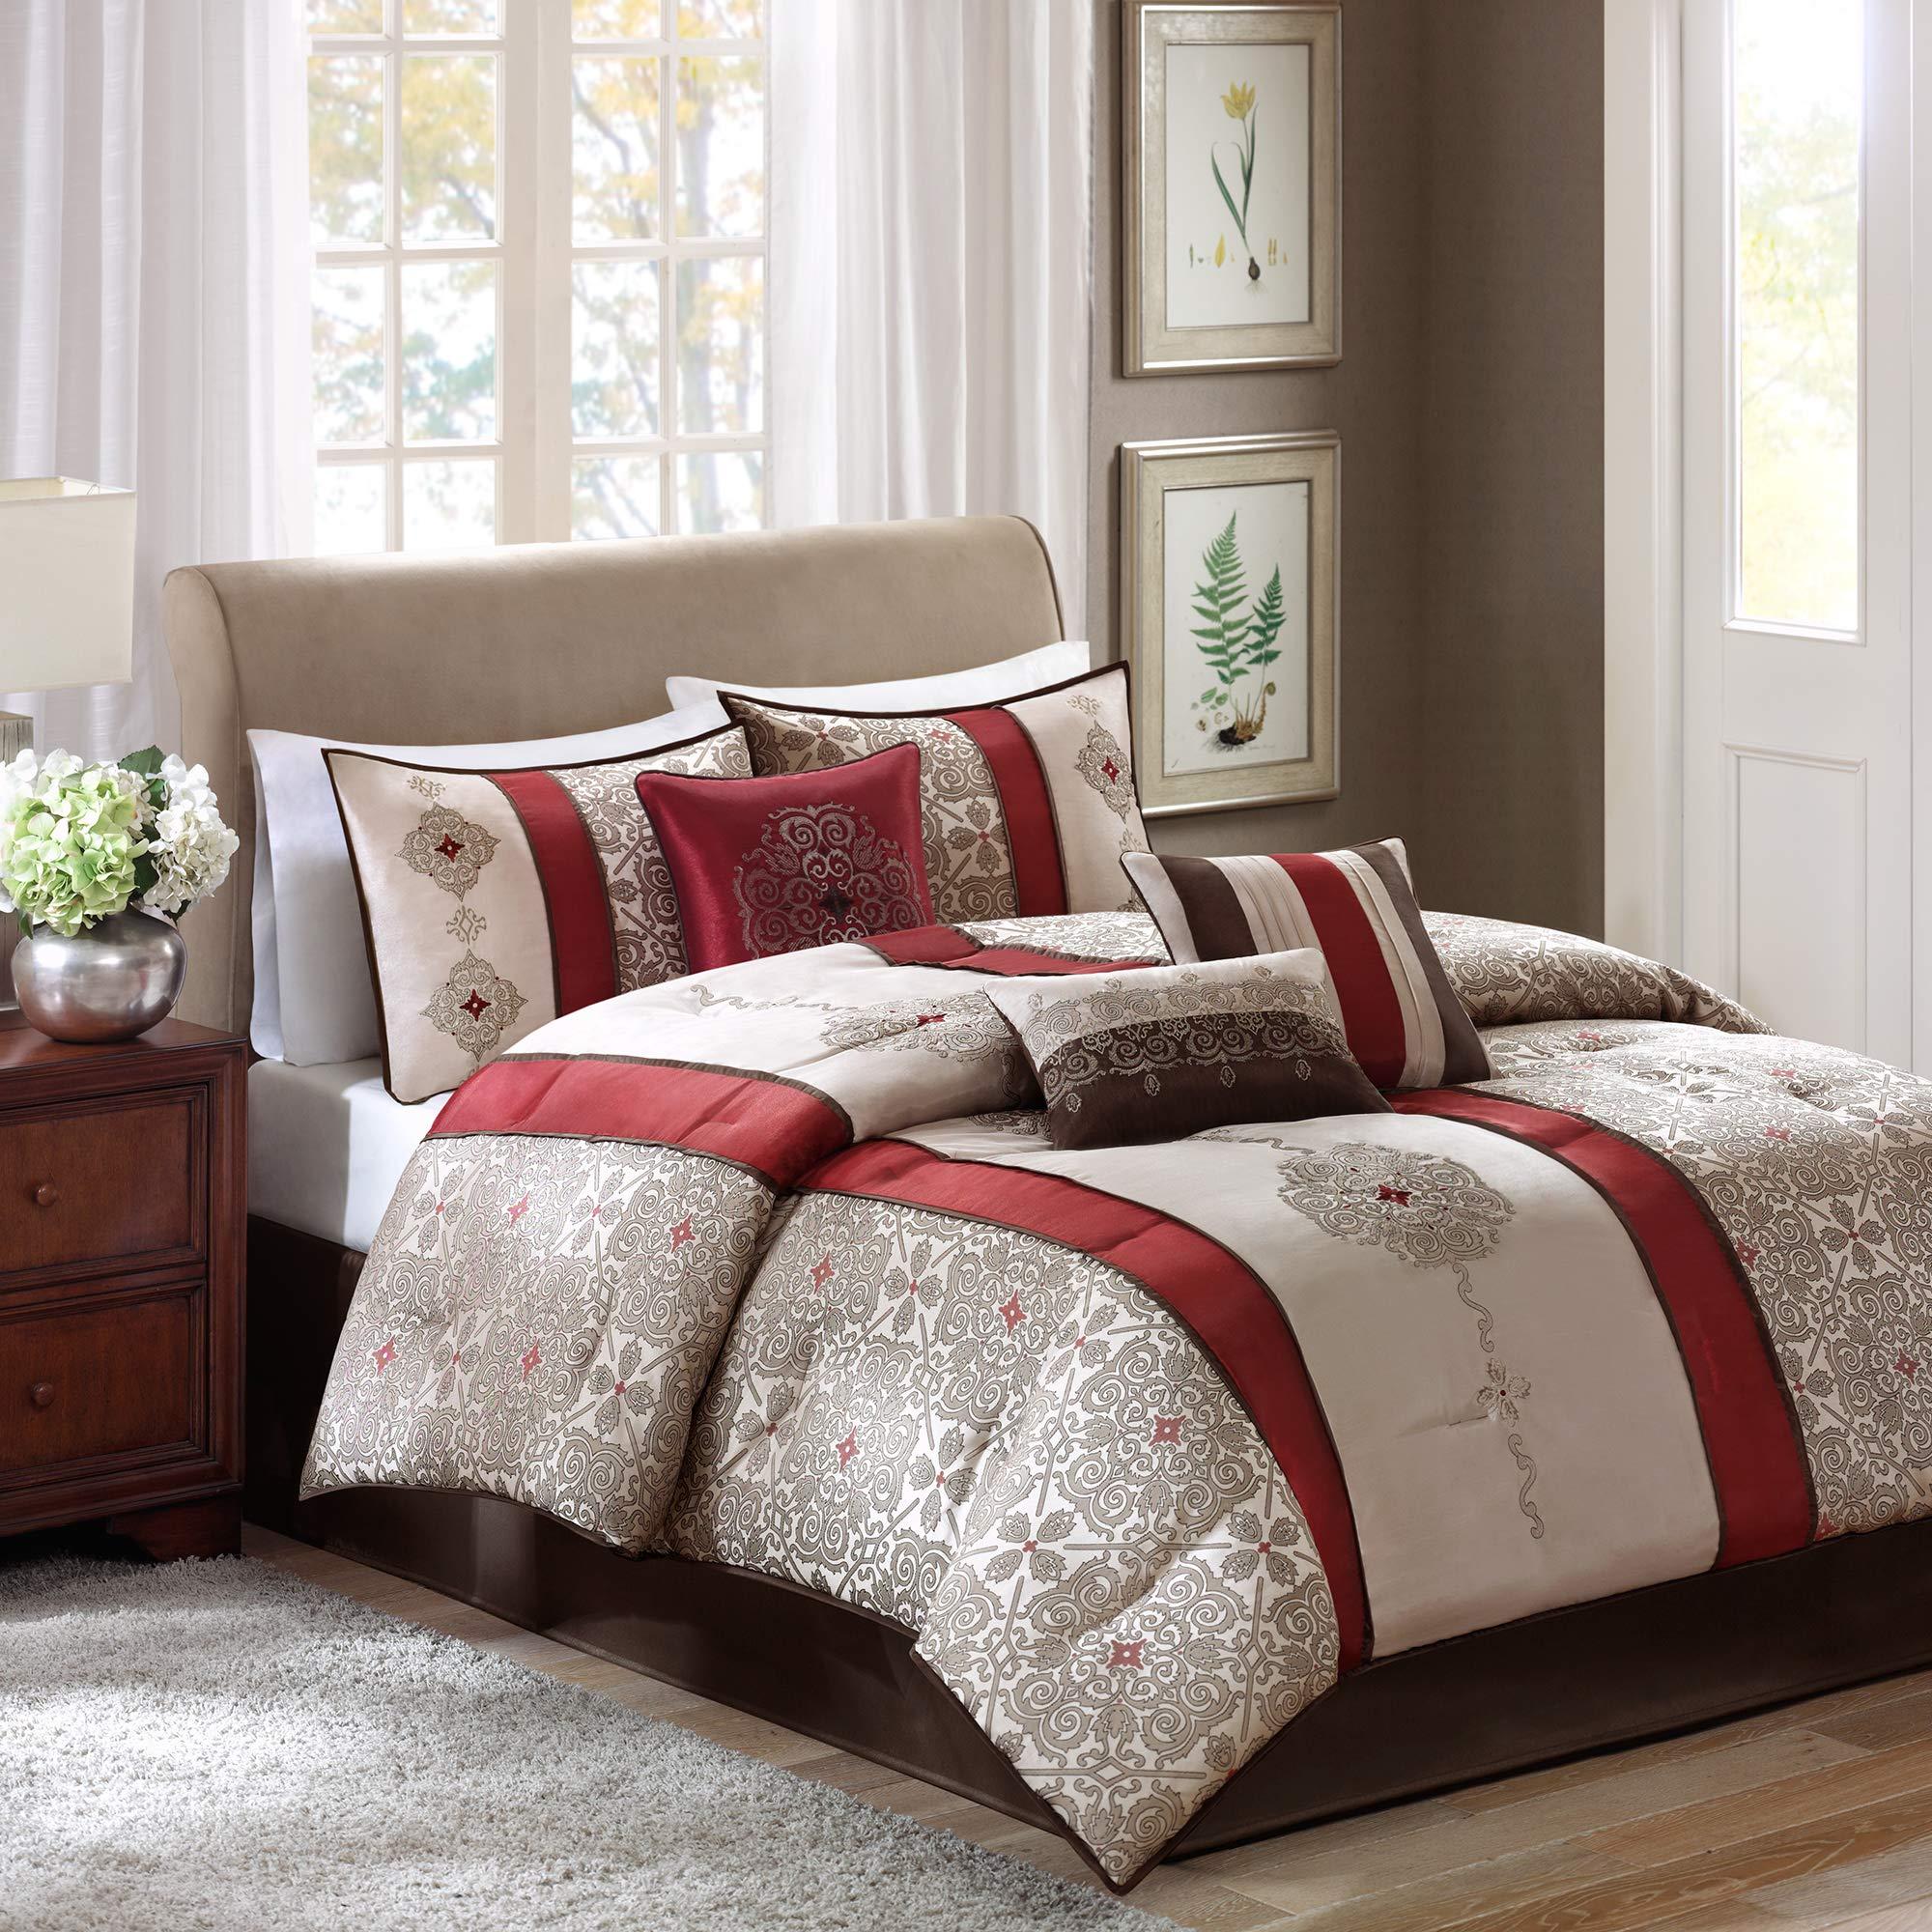 Madison Park Donovan King Size Bed Comforter Set Bed In A Bag - Taupe, Burgundy , Jacquard Pattern - 7 Pieces Bedding Sets - Ultra Soft Microfiber Bedroom Comforters by Madison Park